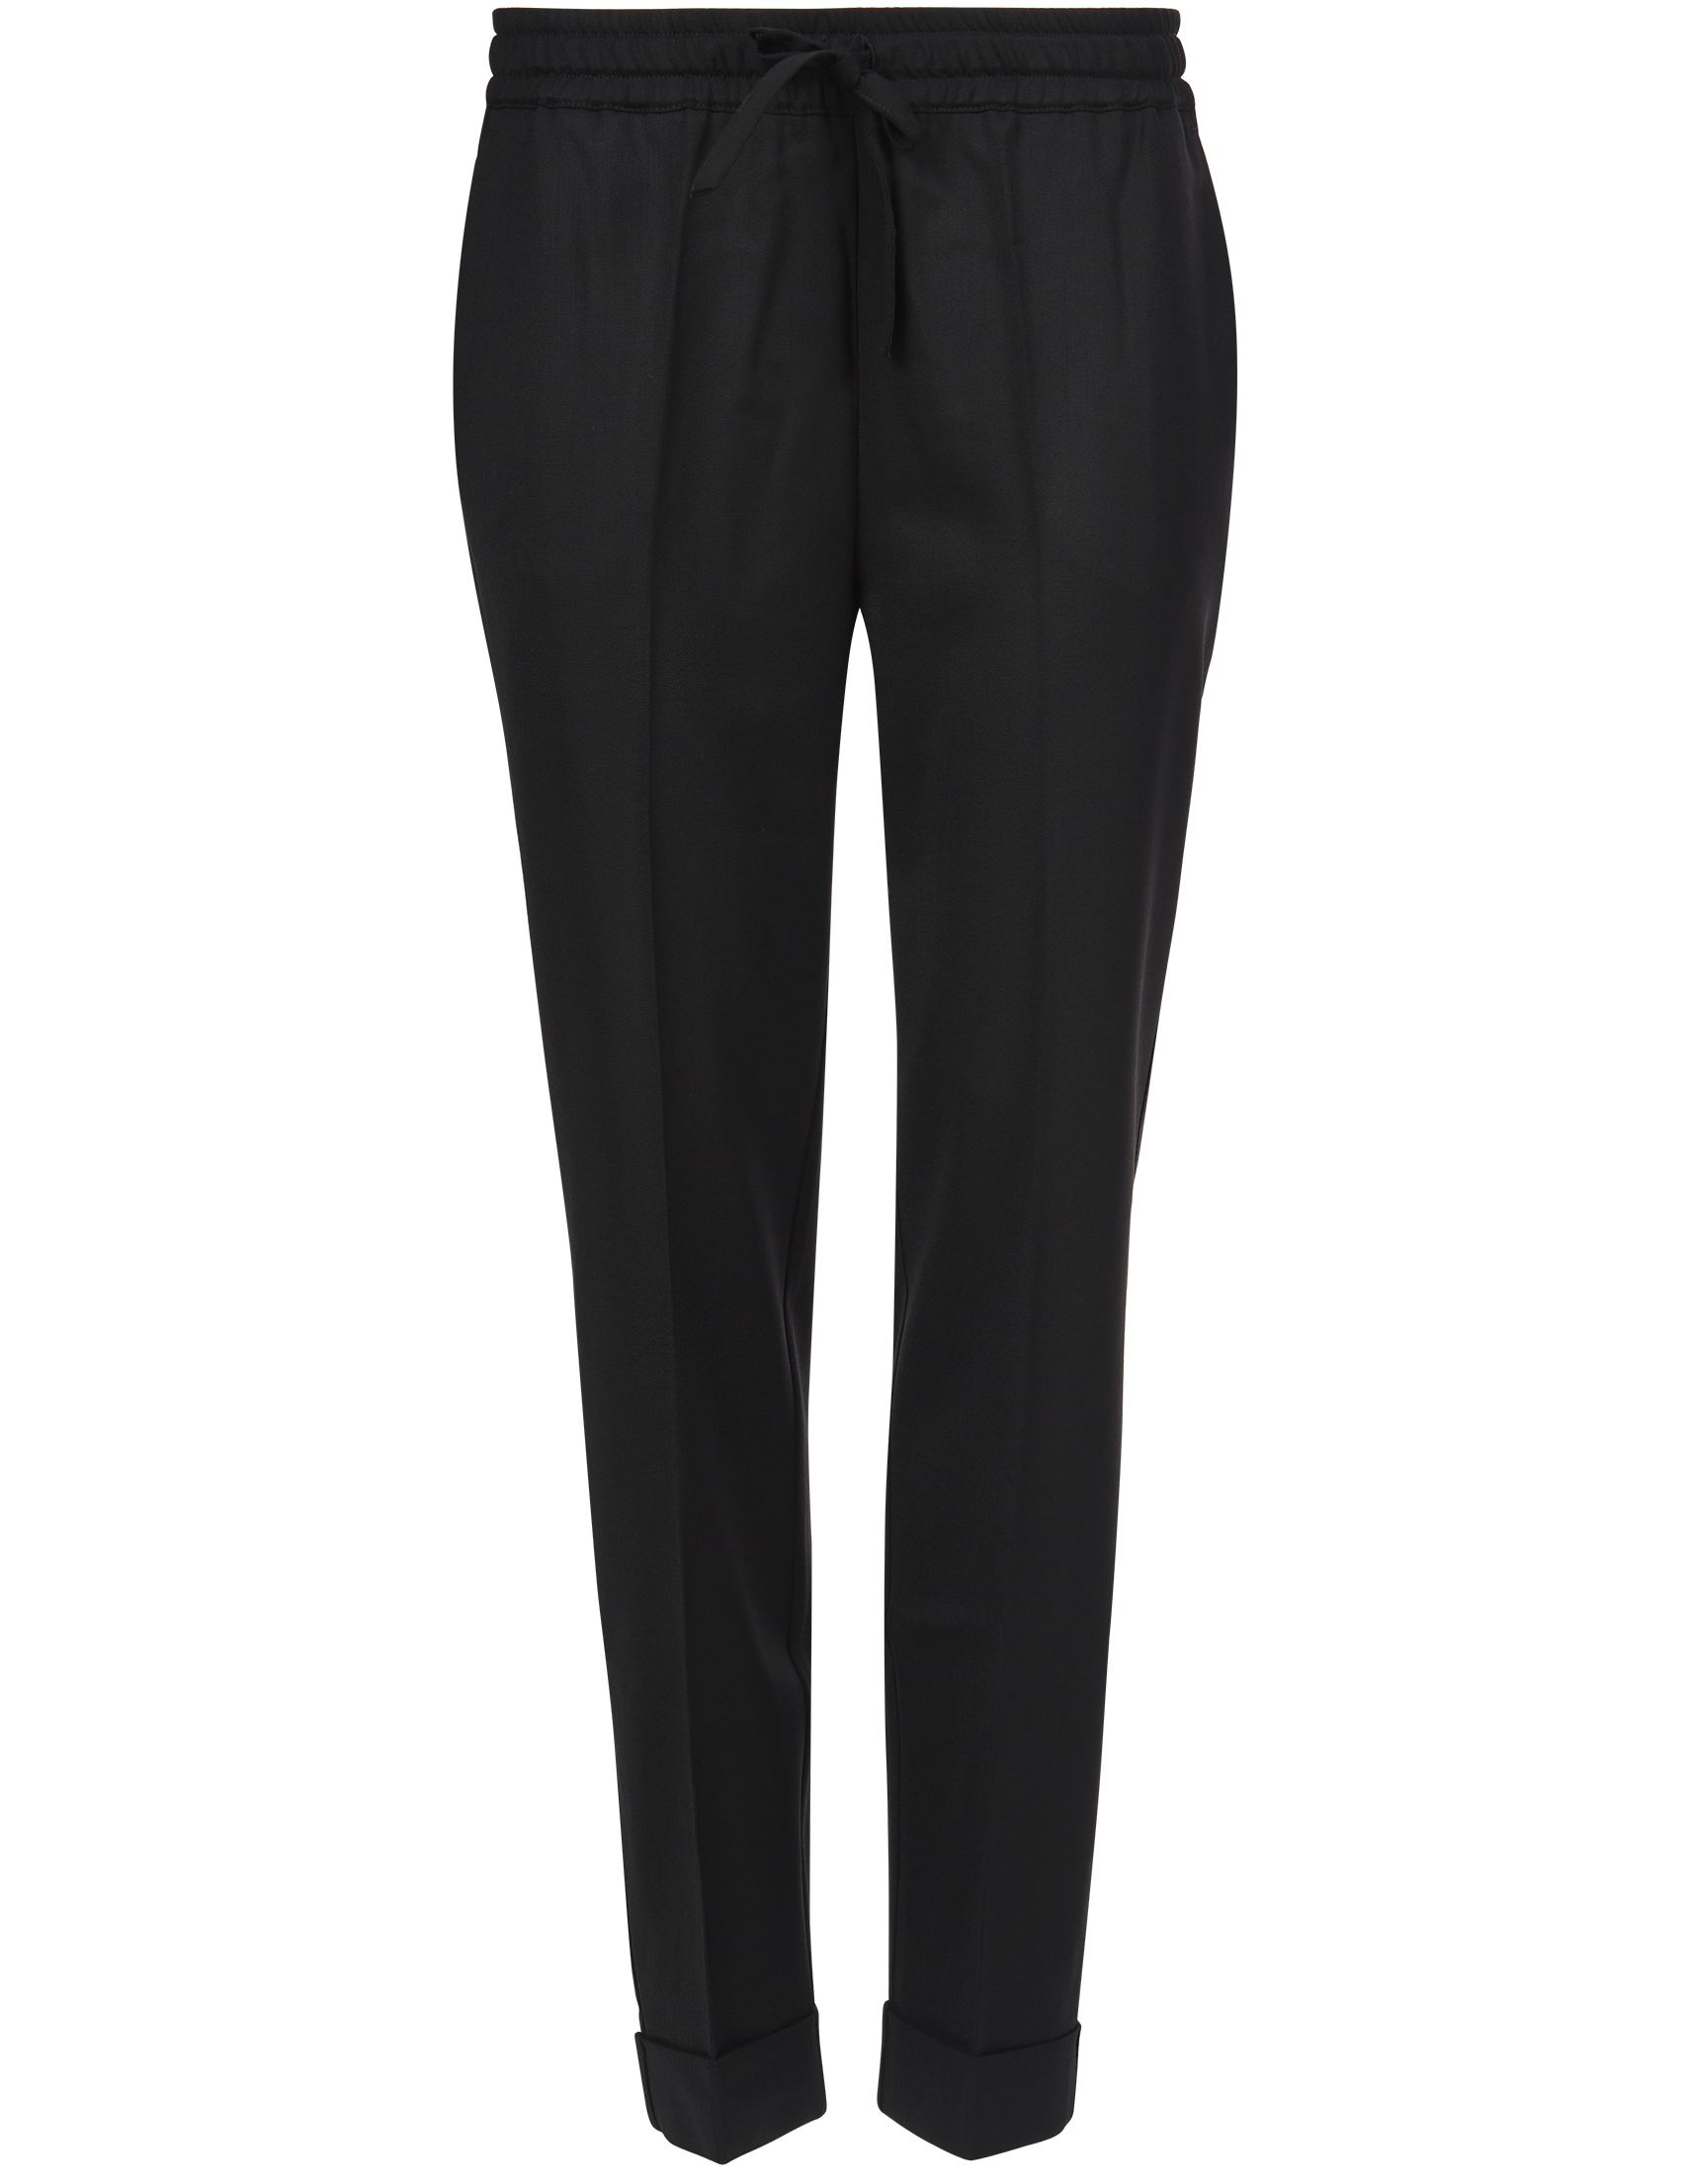 Женские брюки P.A.R.O.S.H. 230204_black